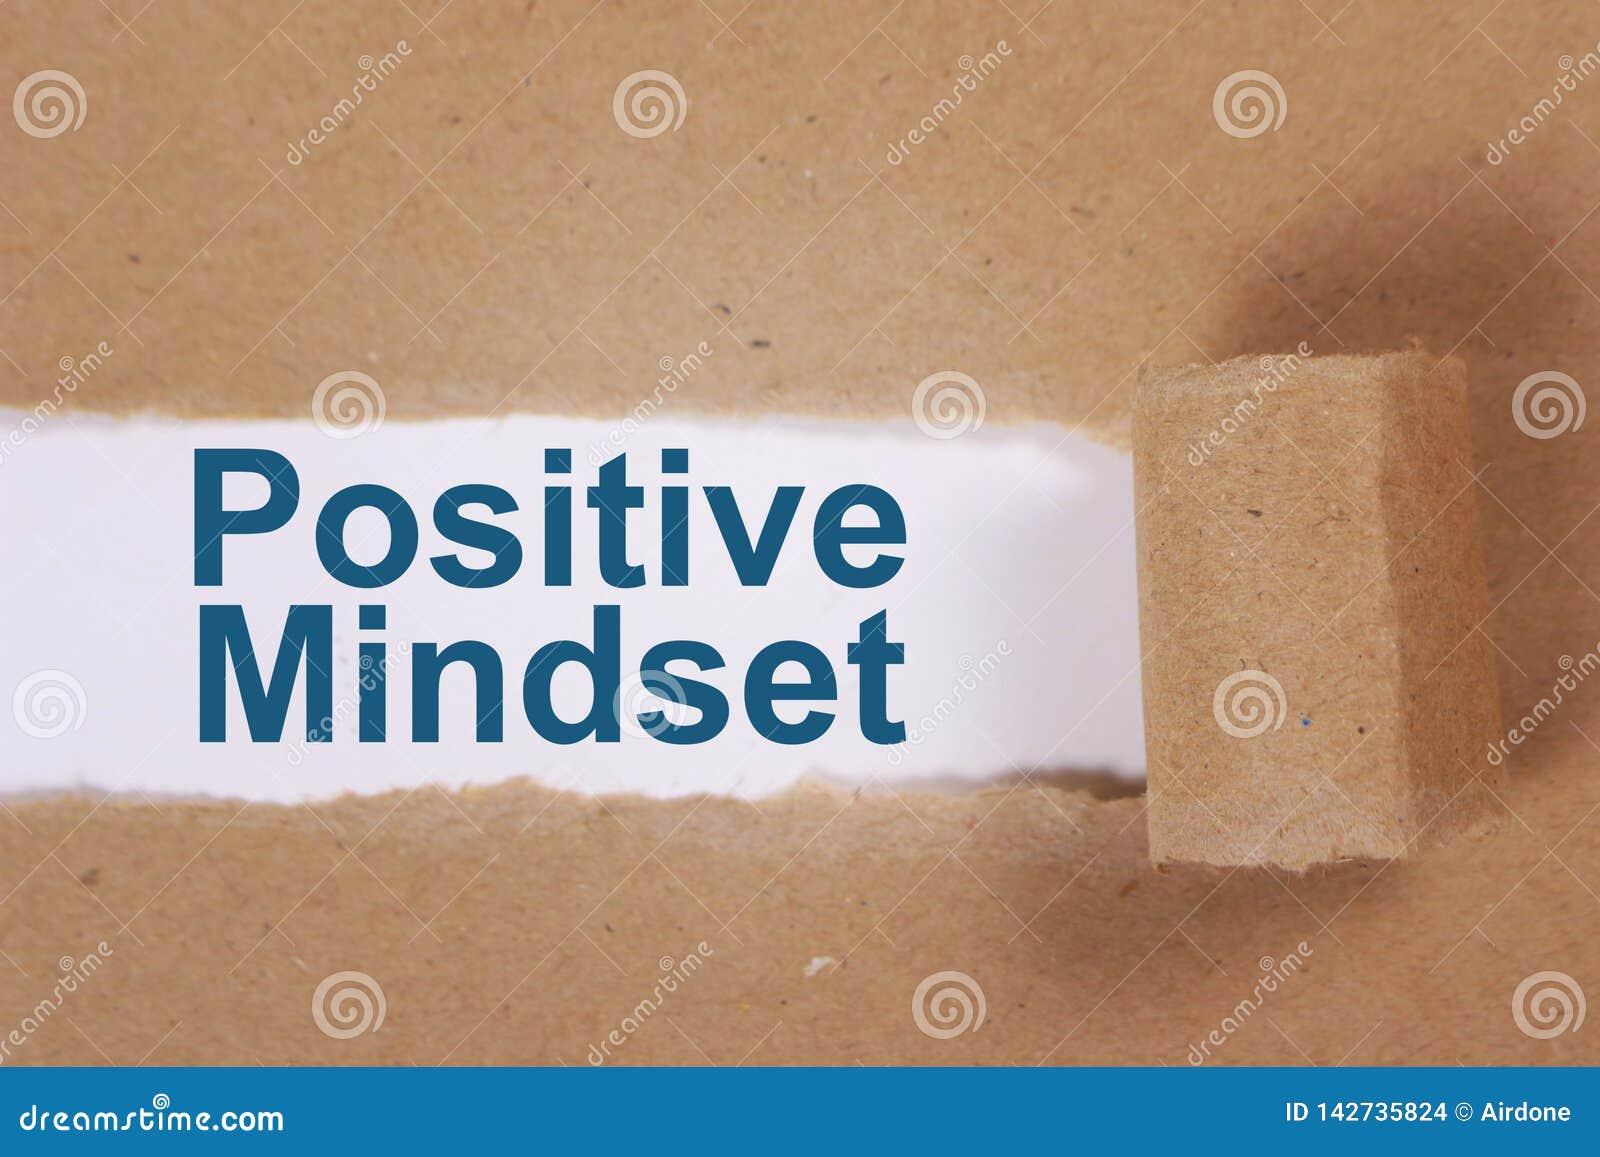 Positive Mindset, Motivational Words Quotes Concept